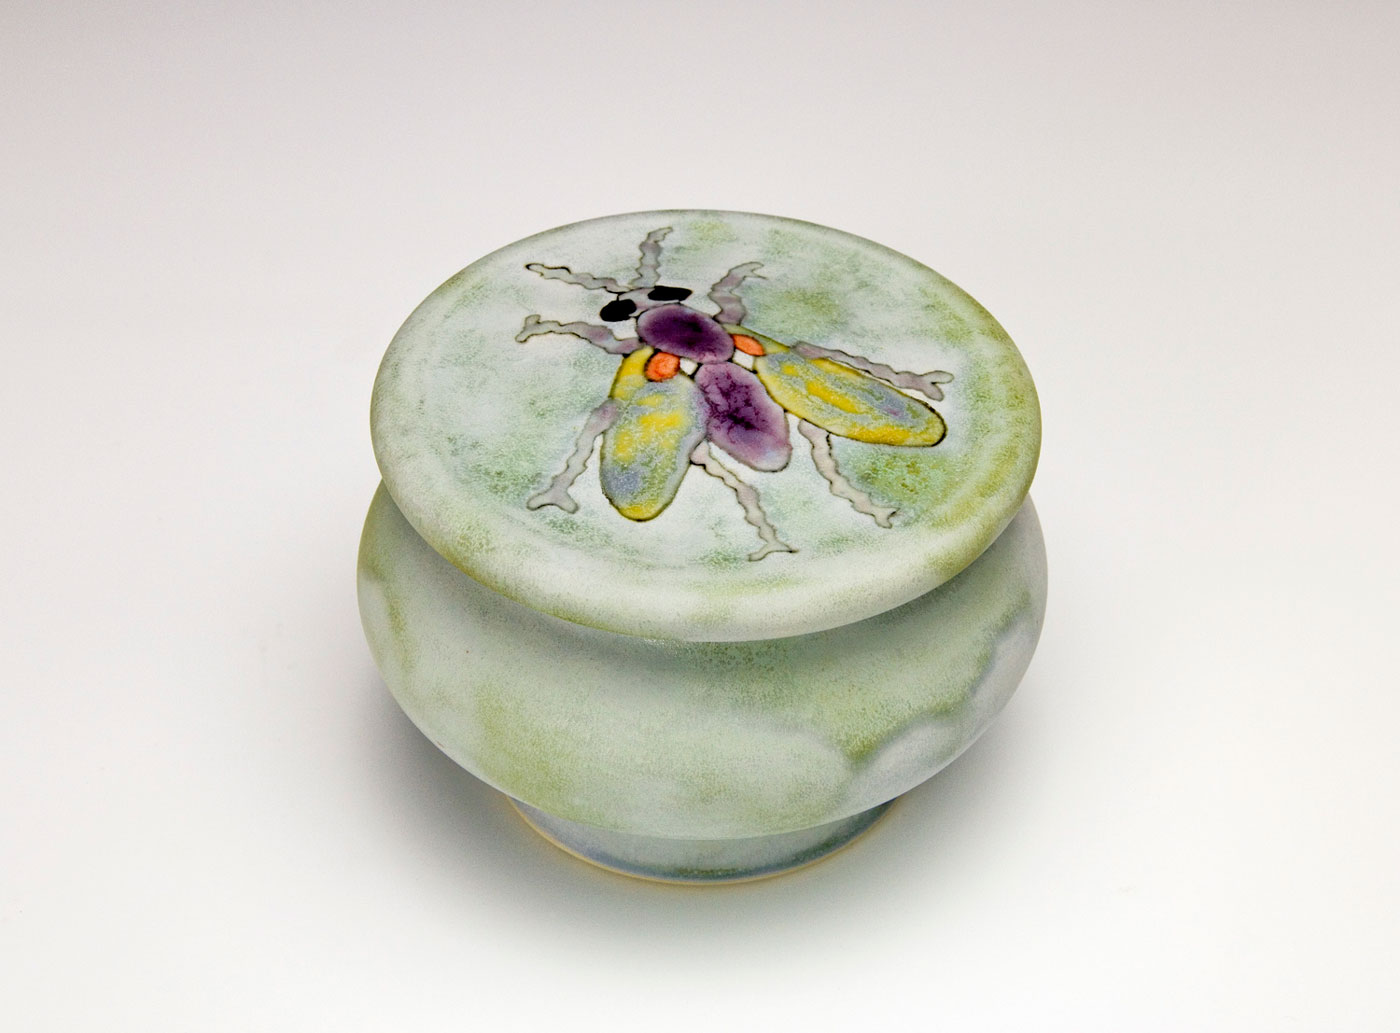 Jewelry-jar-Fly-glaze-drawing-Samantha-Henneke-Seagrove-Pottery.jpg